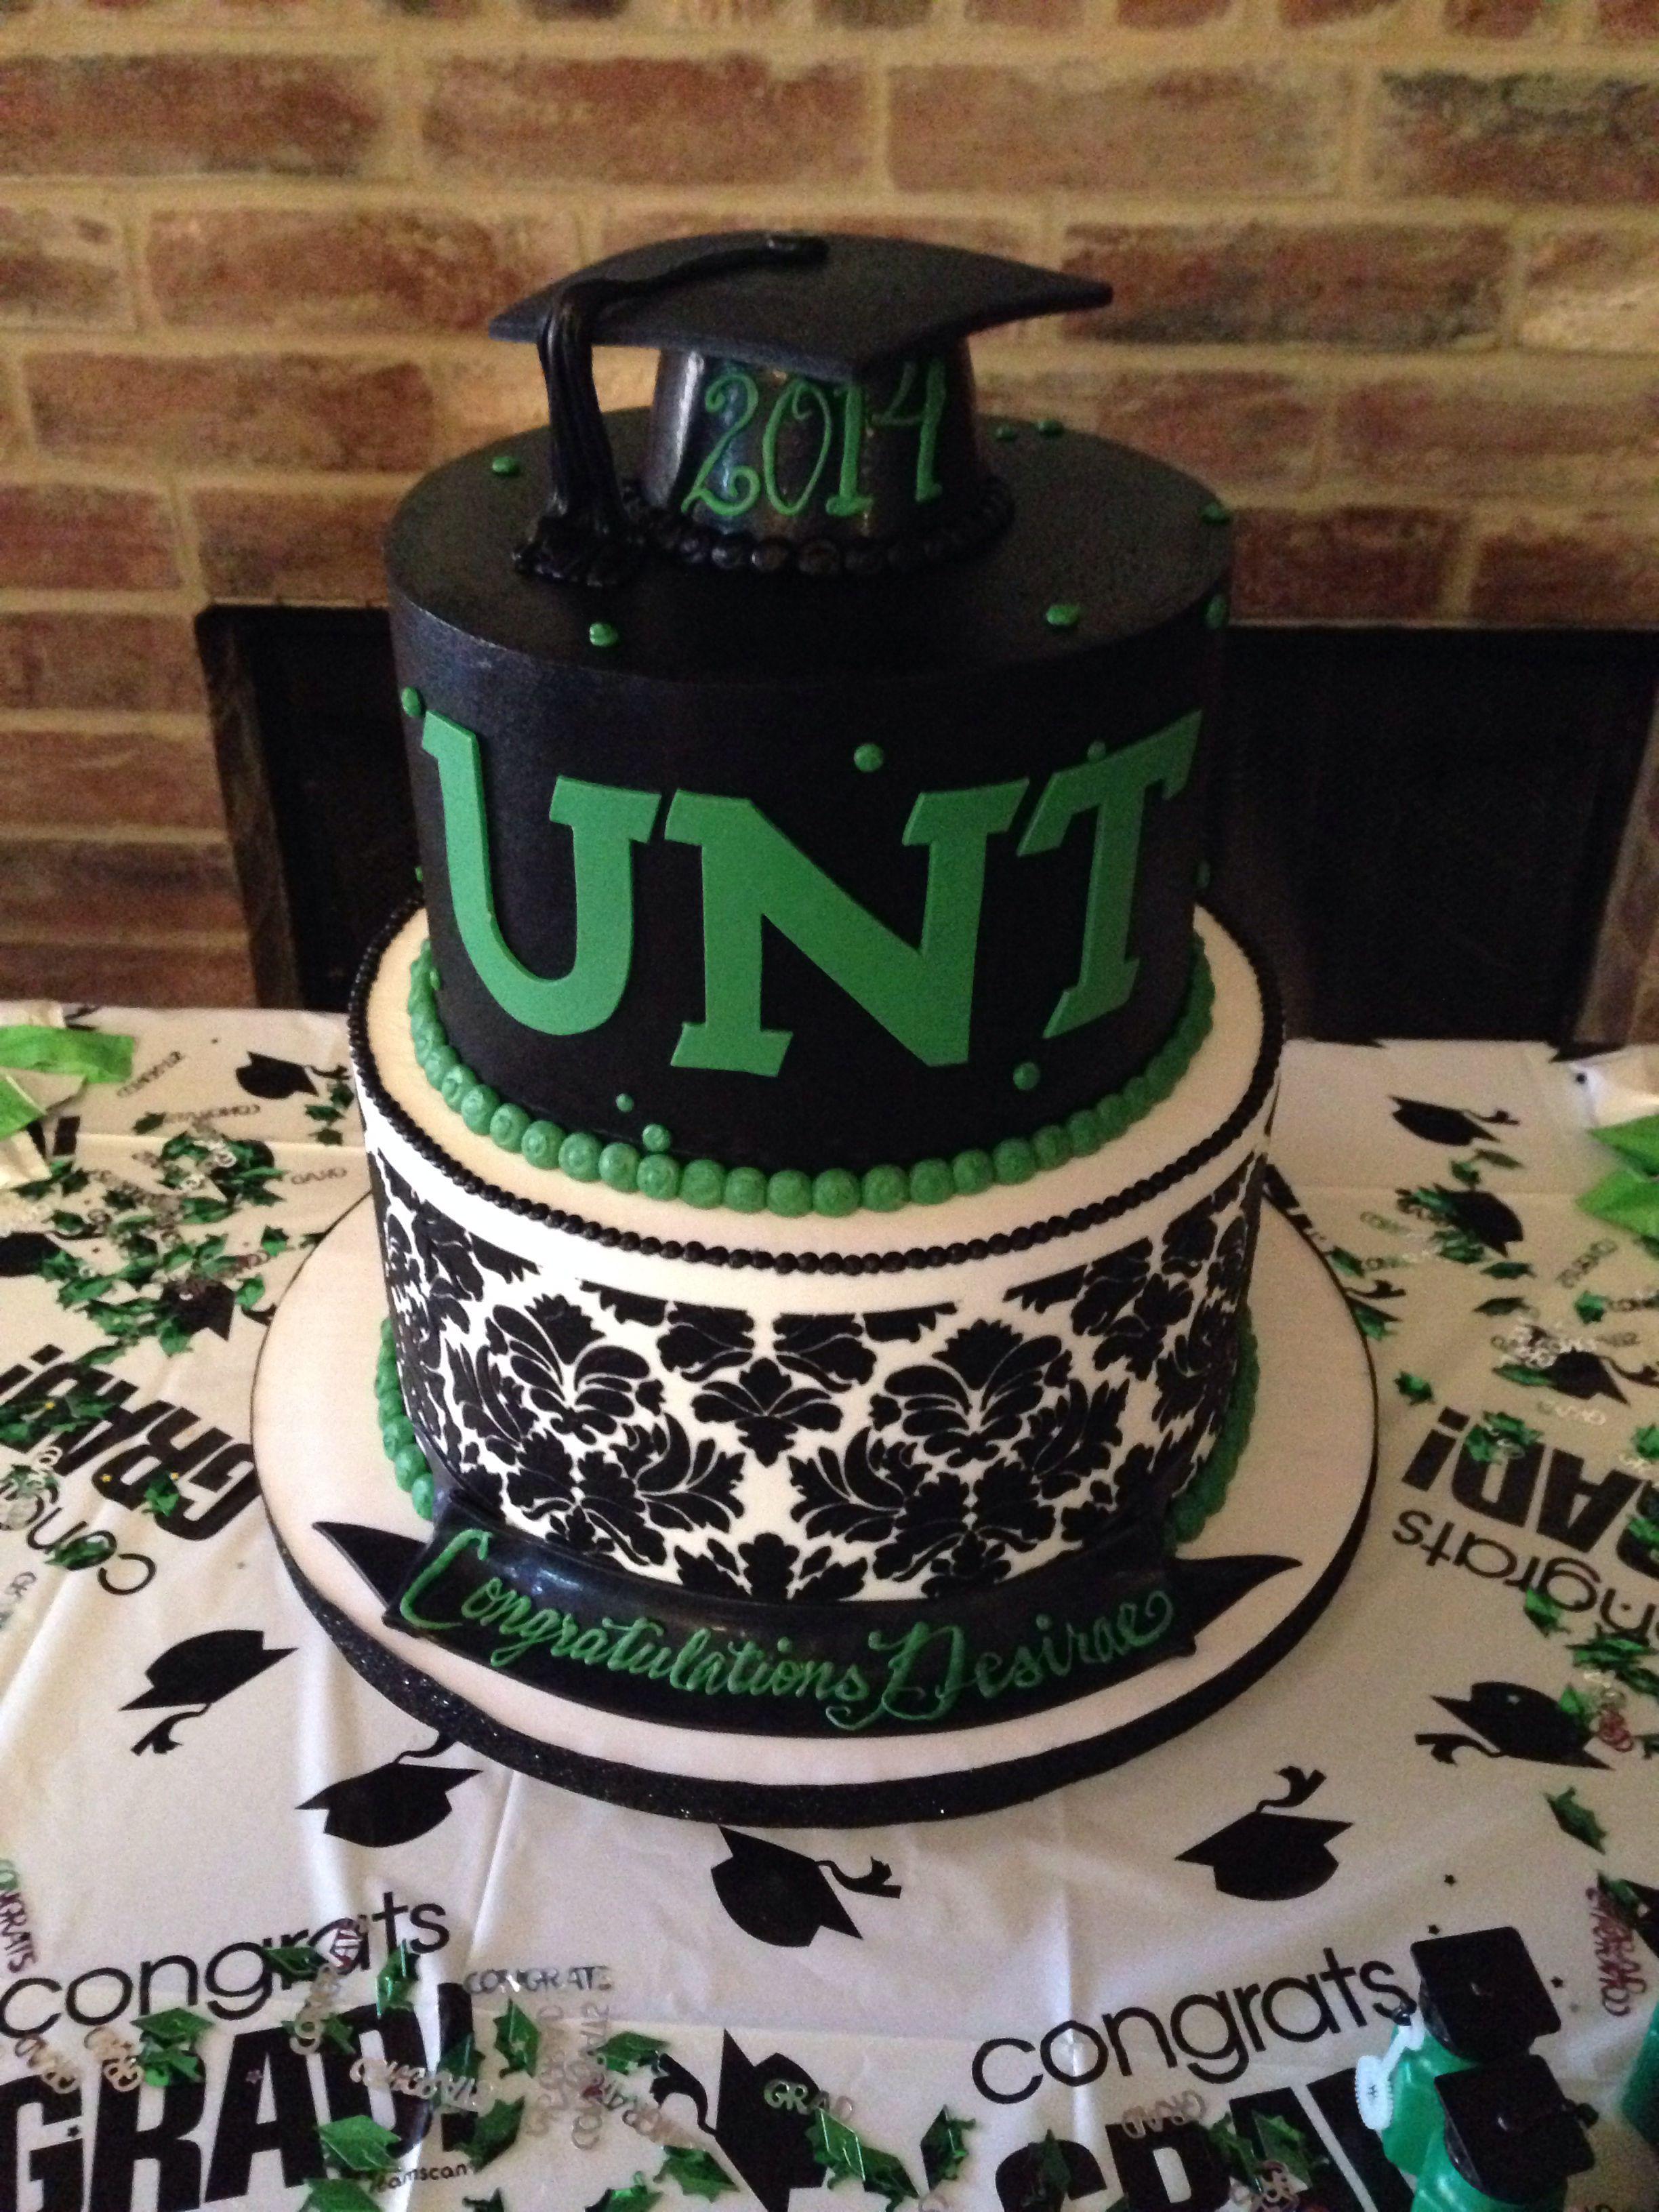 Unt Graduation Cake Graduation Party Planning